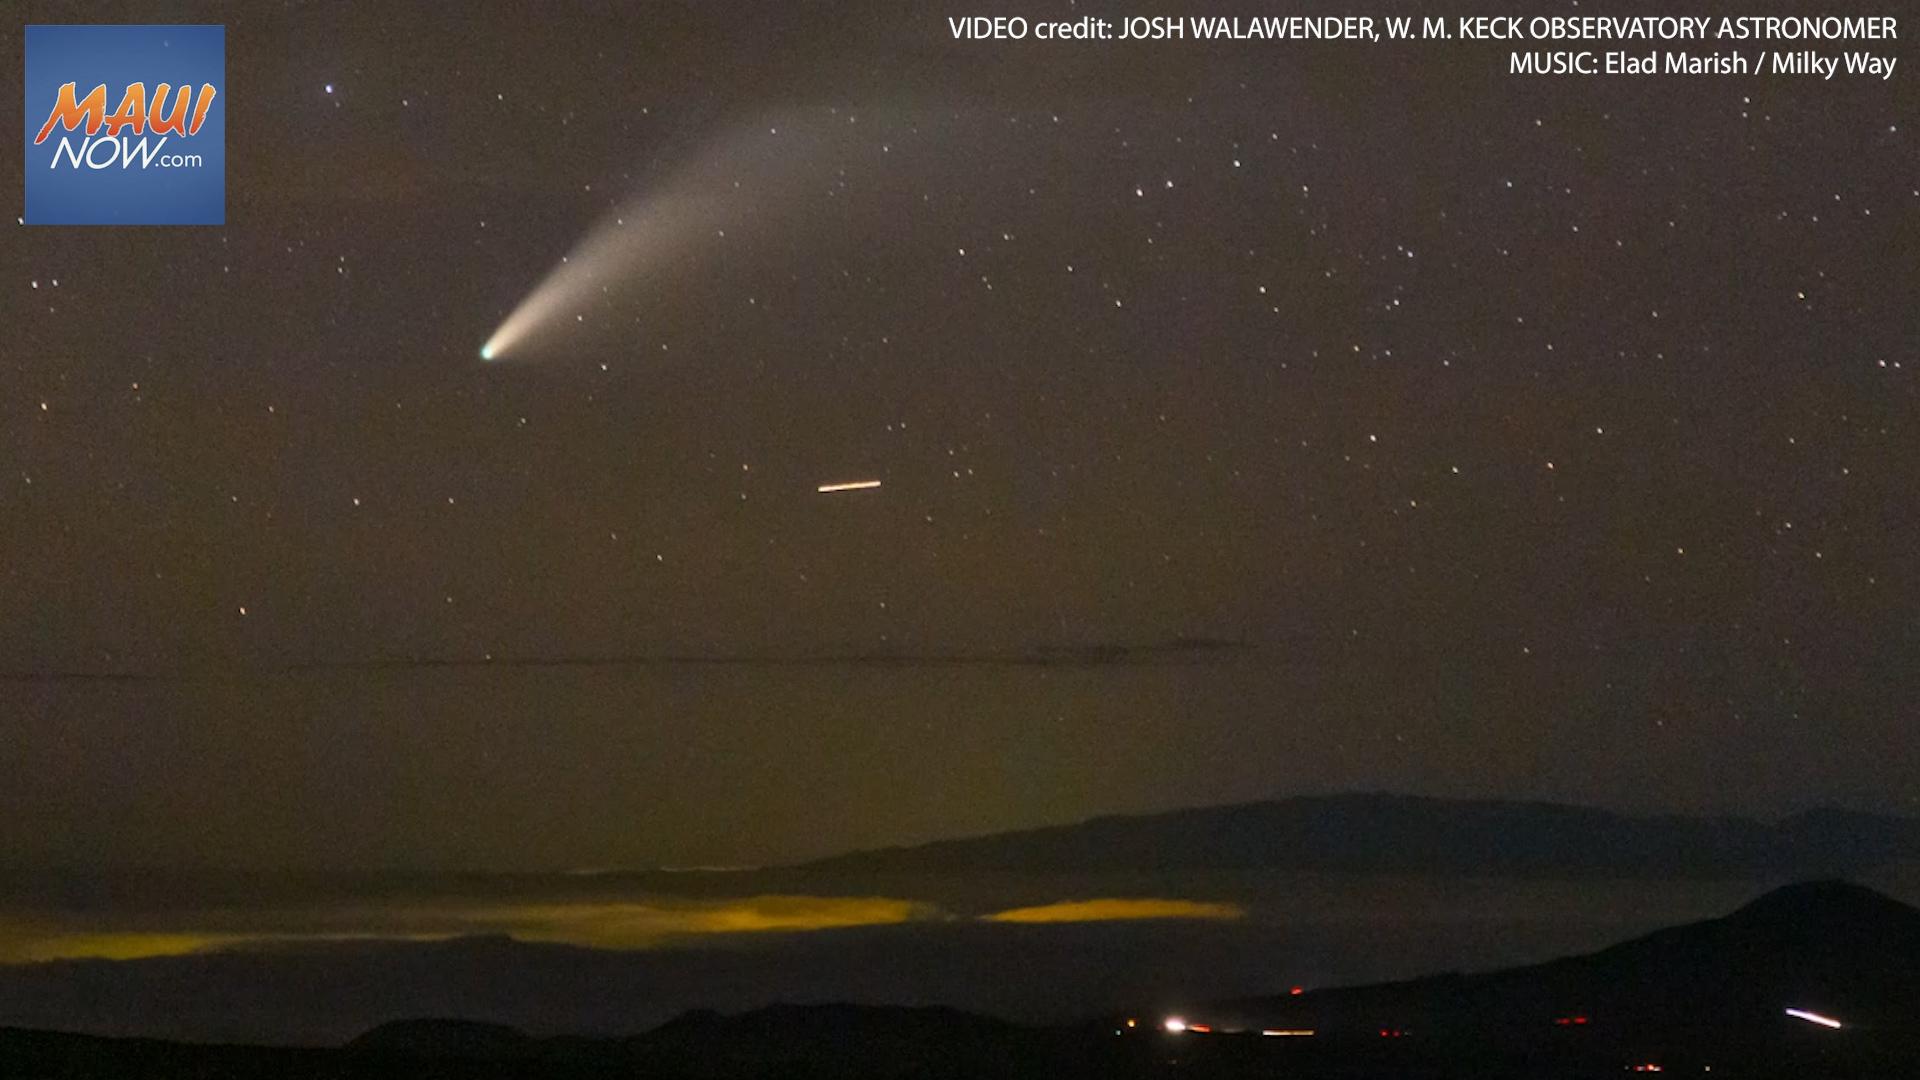 Timelapse Video of Comet NEOWISE Setting Behind Maui's Haleakalā